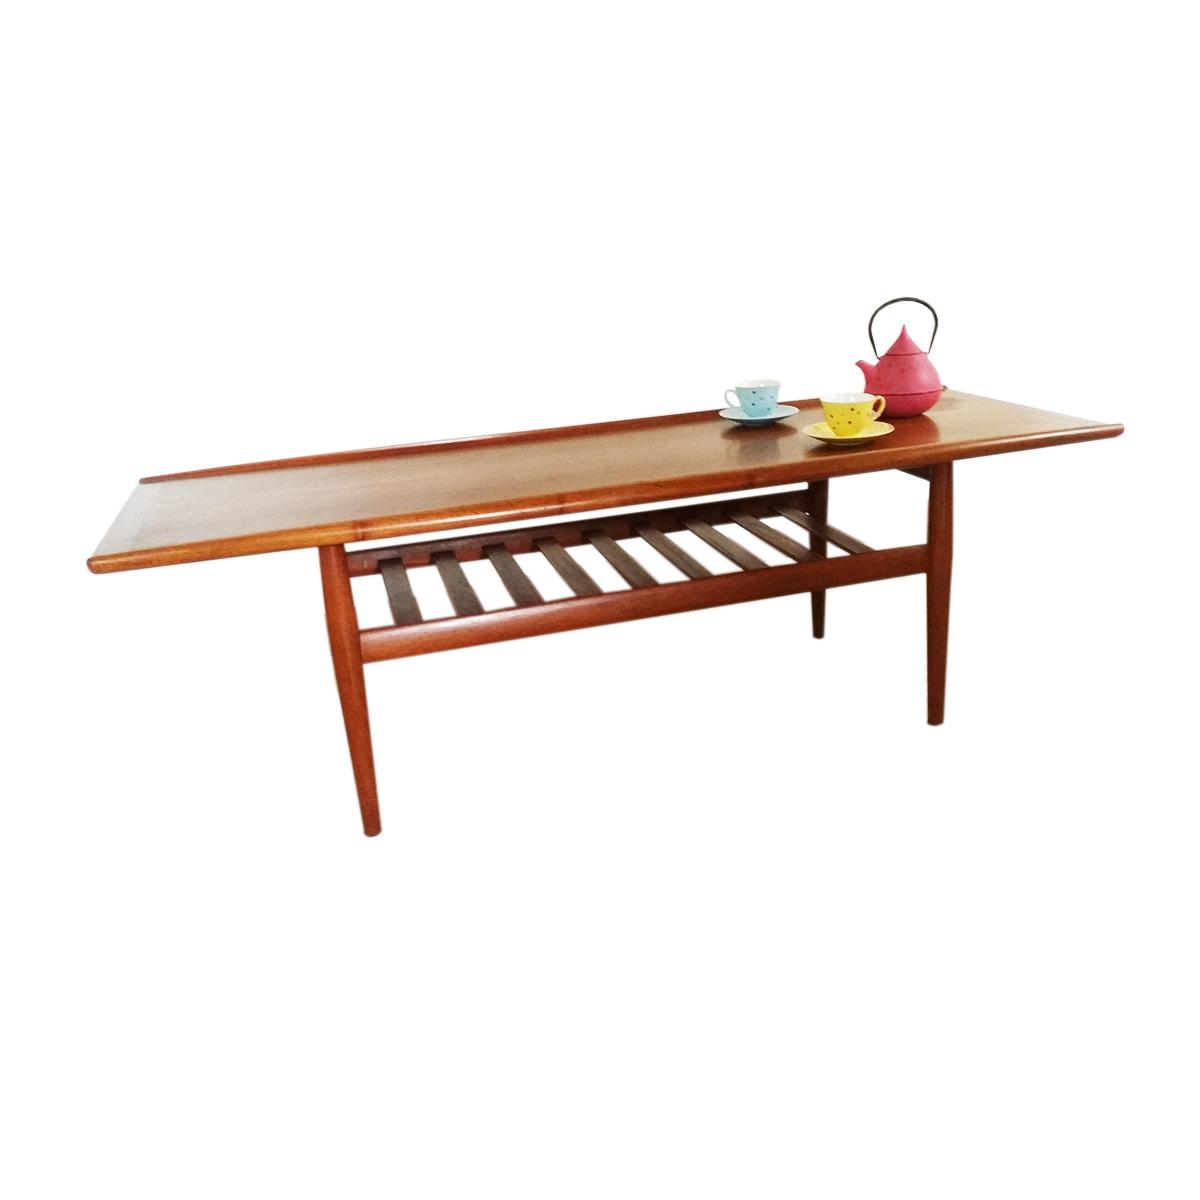 grete-jalk-glostrup-teak-coffee-table